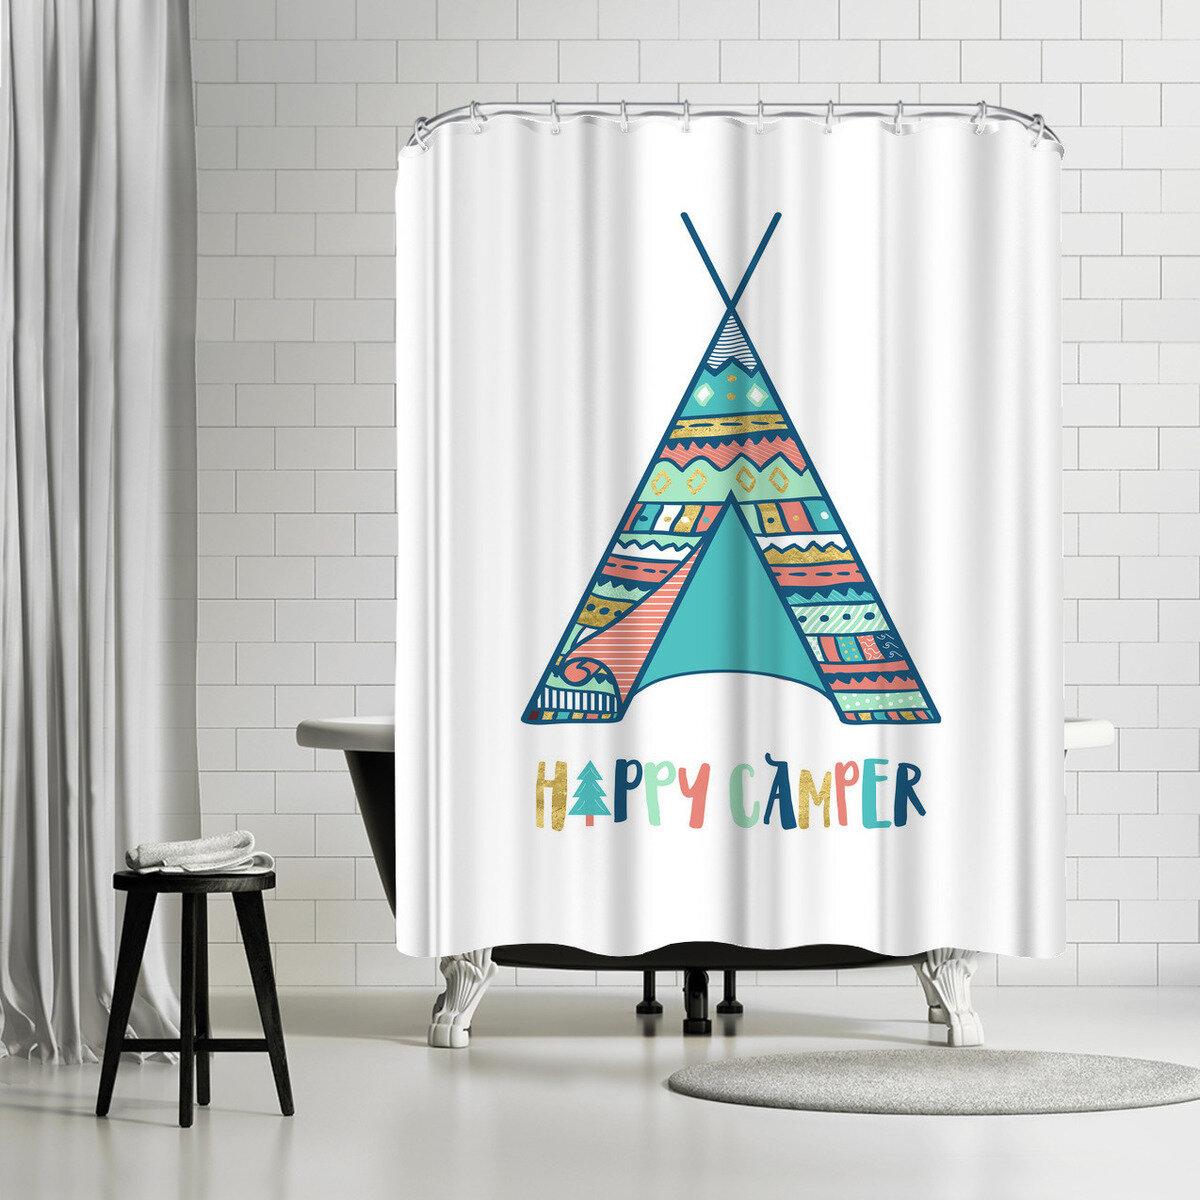 East Urban Home Elena David Happy Camper Single Shower Curtain Wayfair